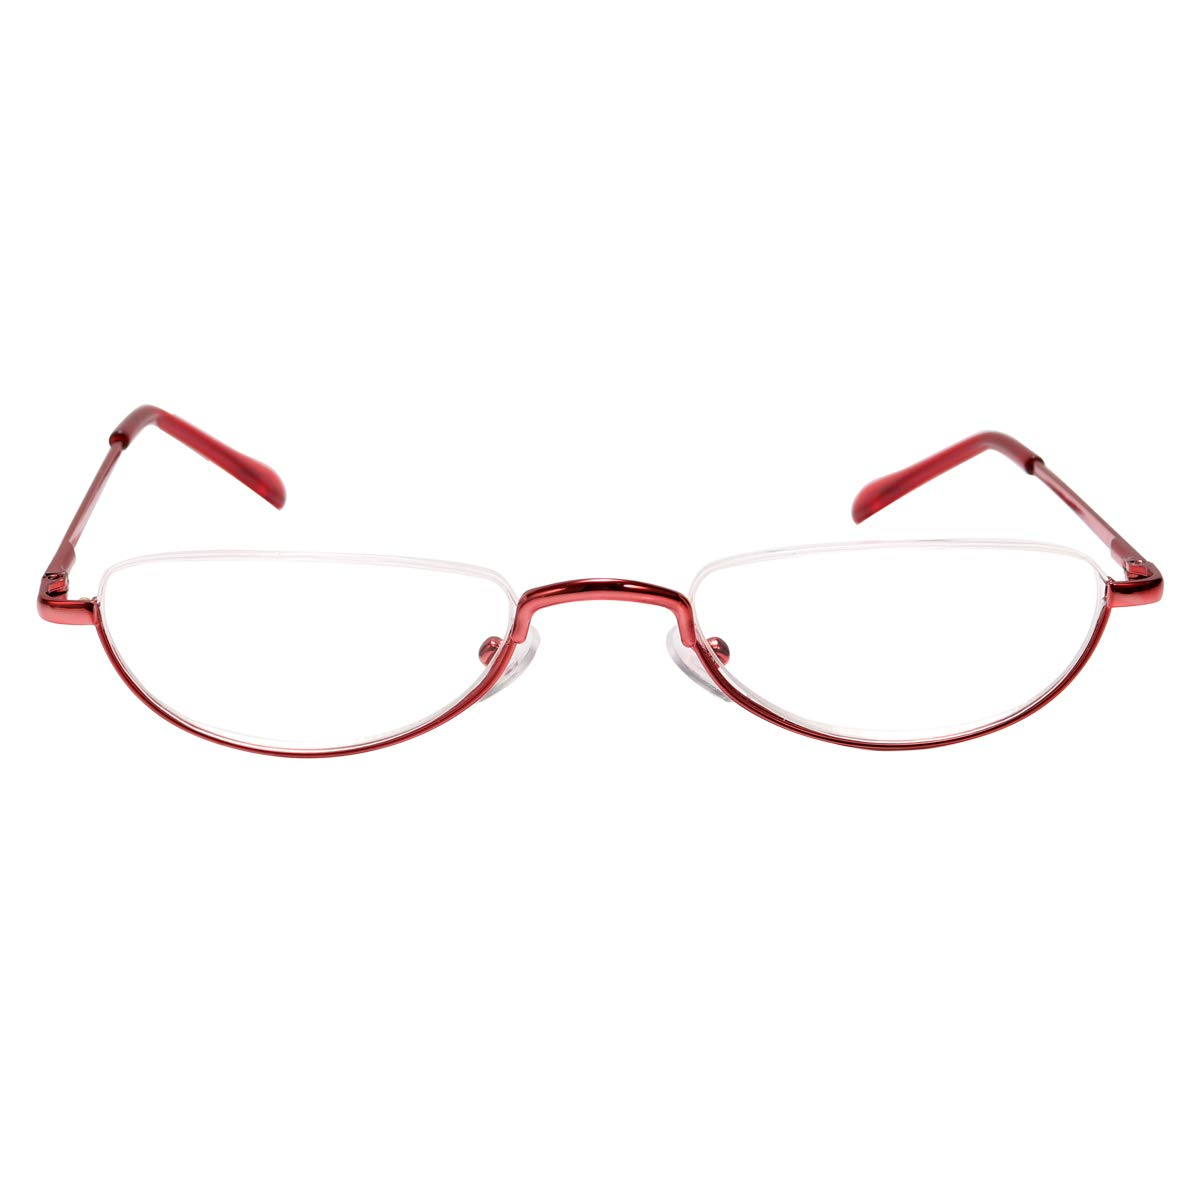 Fuaisi Vintage Alloy Half Moon Classic Reading Glasses Men And Women Half Frame Slim Glasses